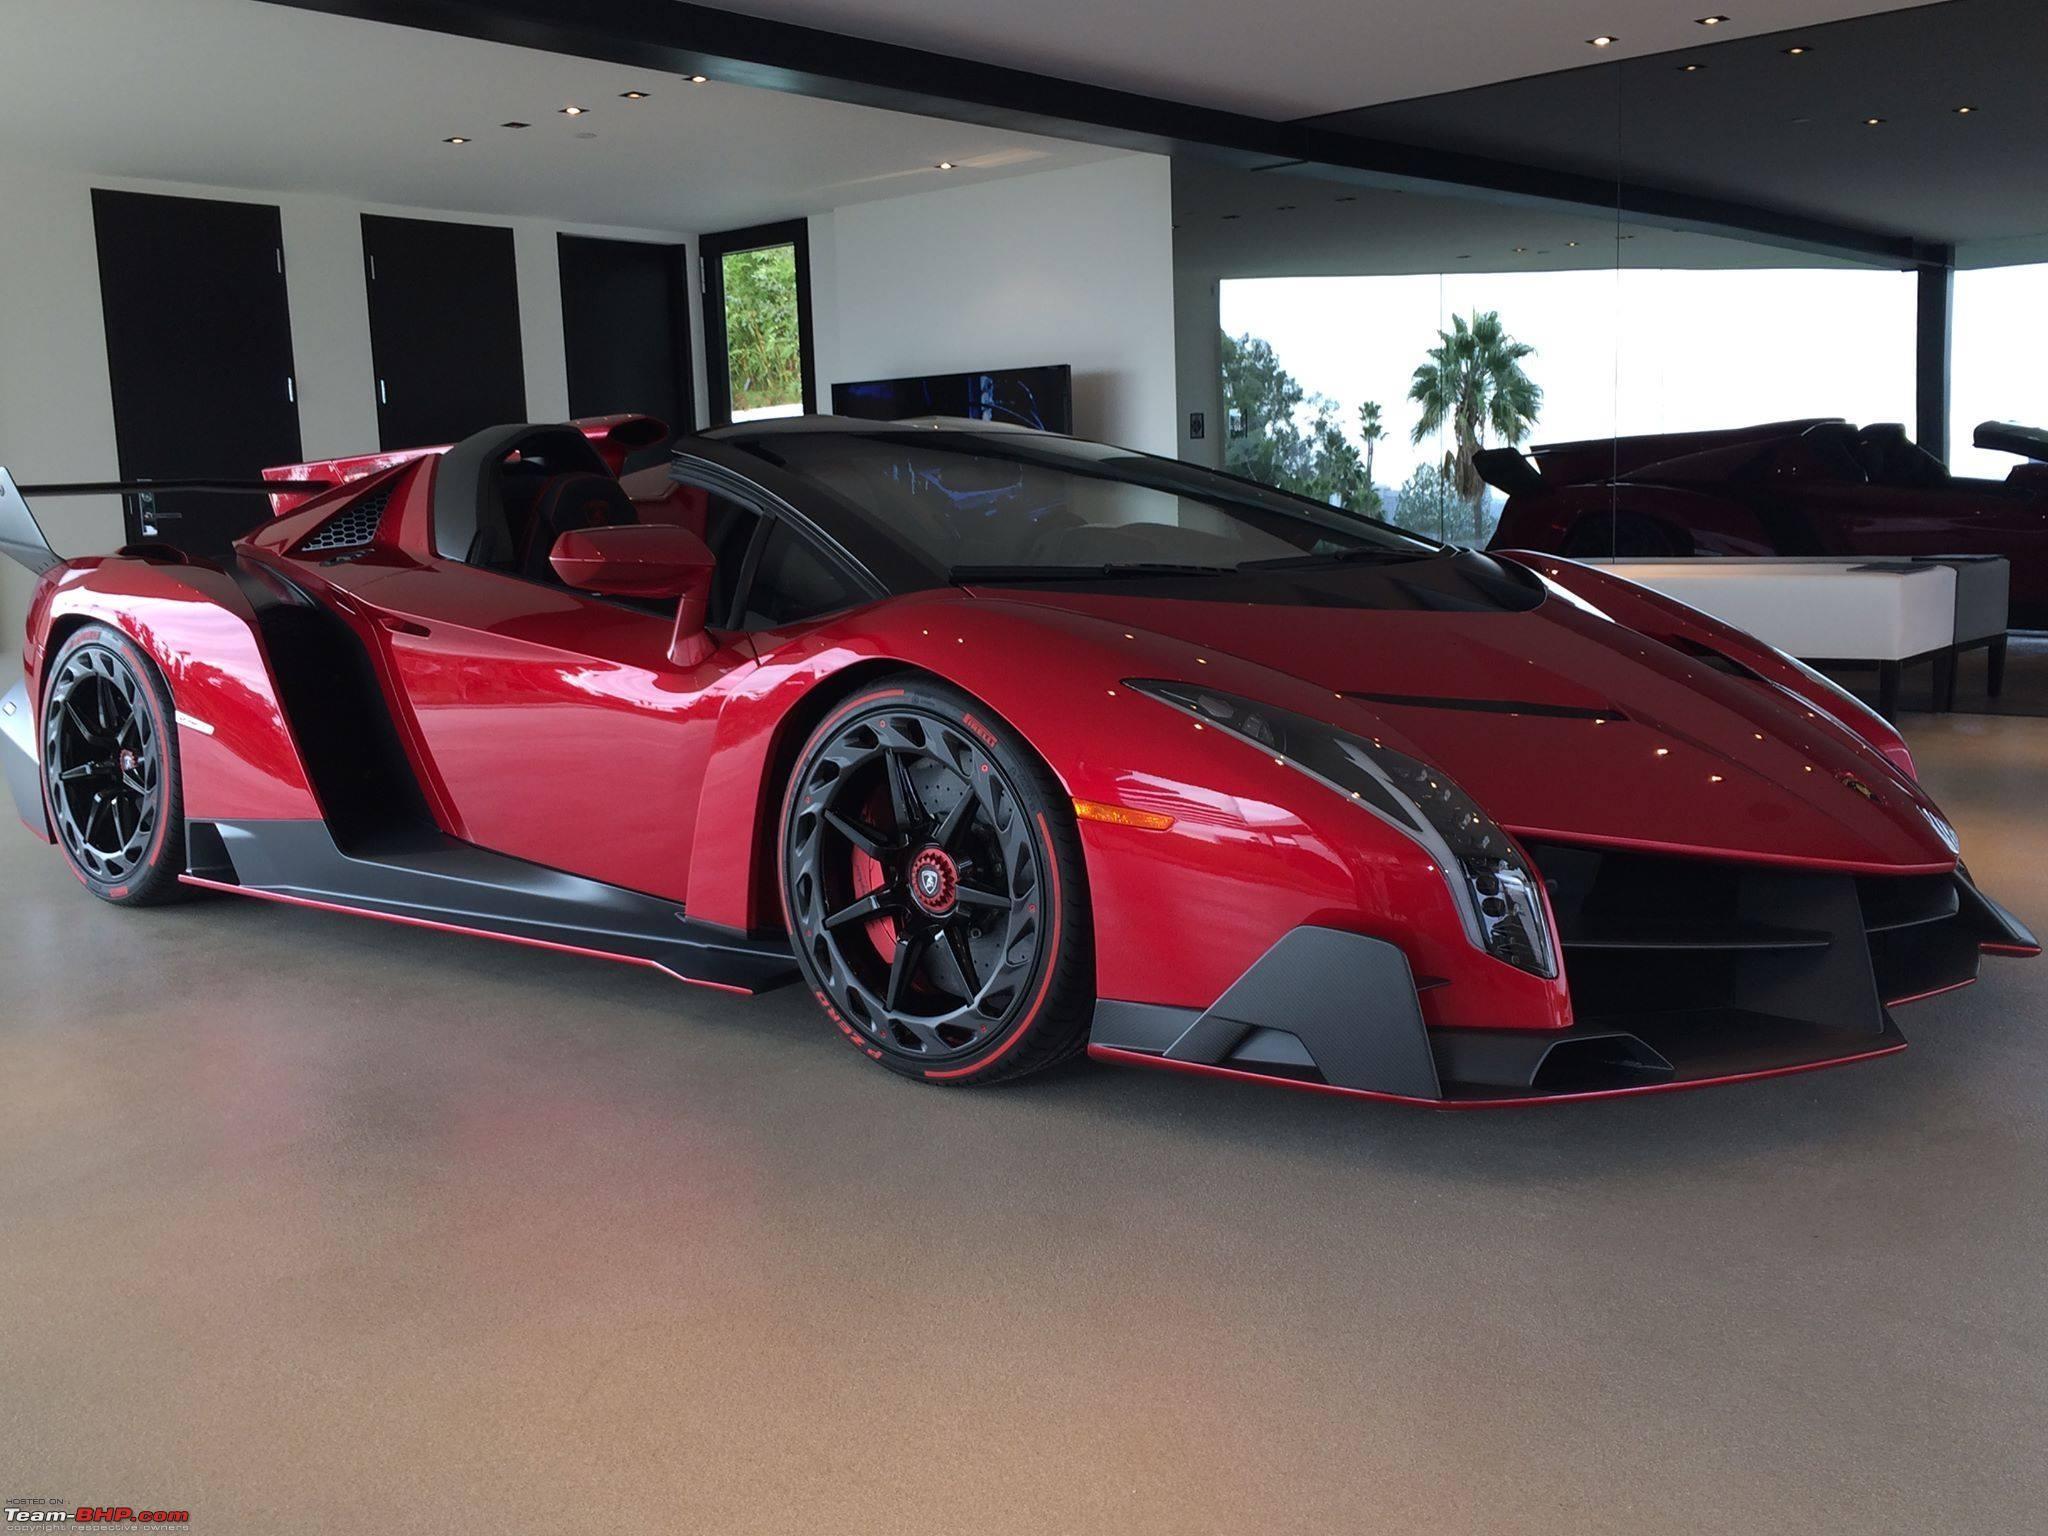 Lamborghini Veneno Wallpapers (64+ images)